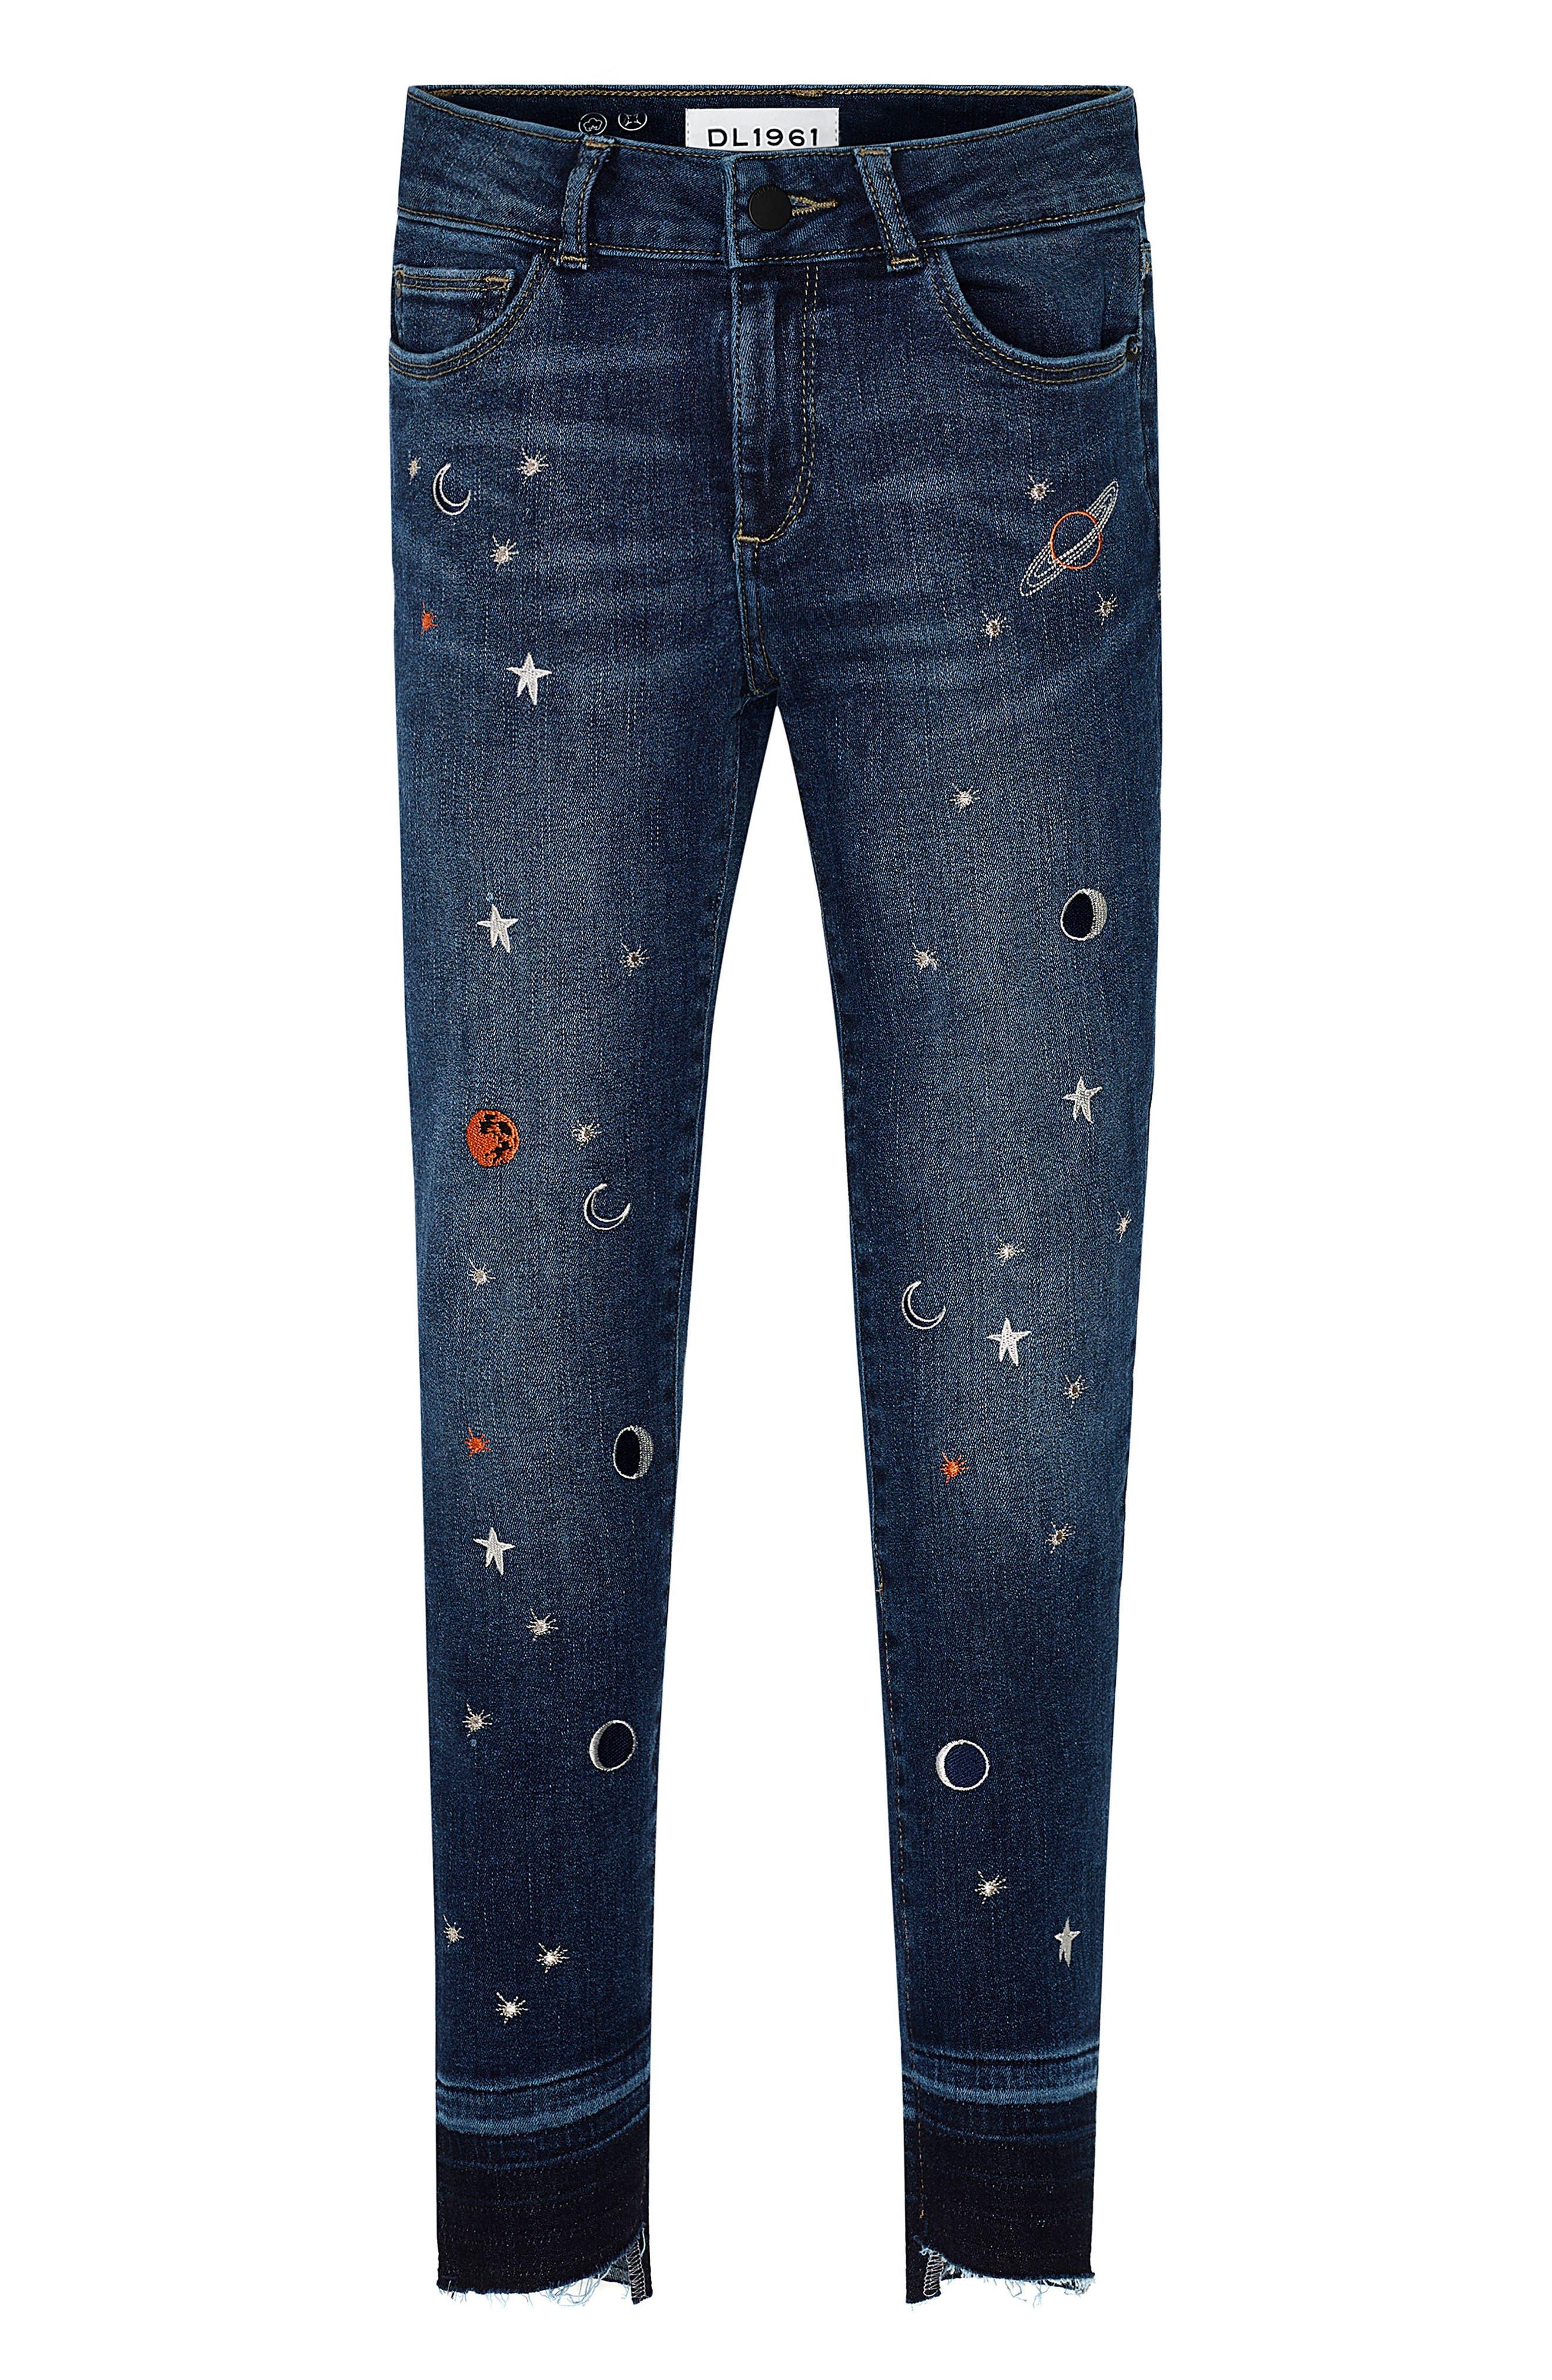 DL1961 Chloe Galaxy Embroidered Skinny Jeans (Big Girls)